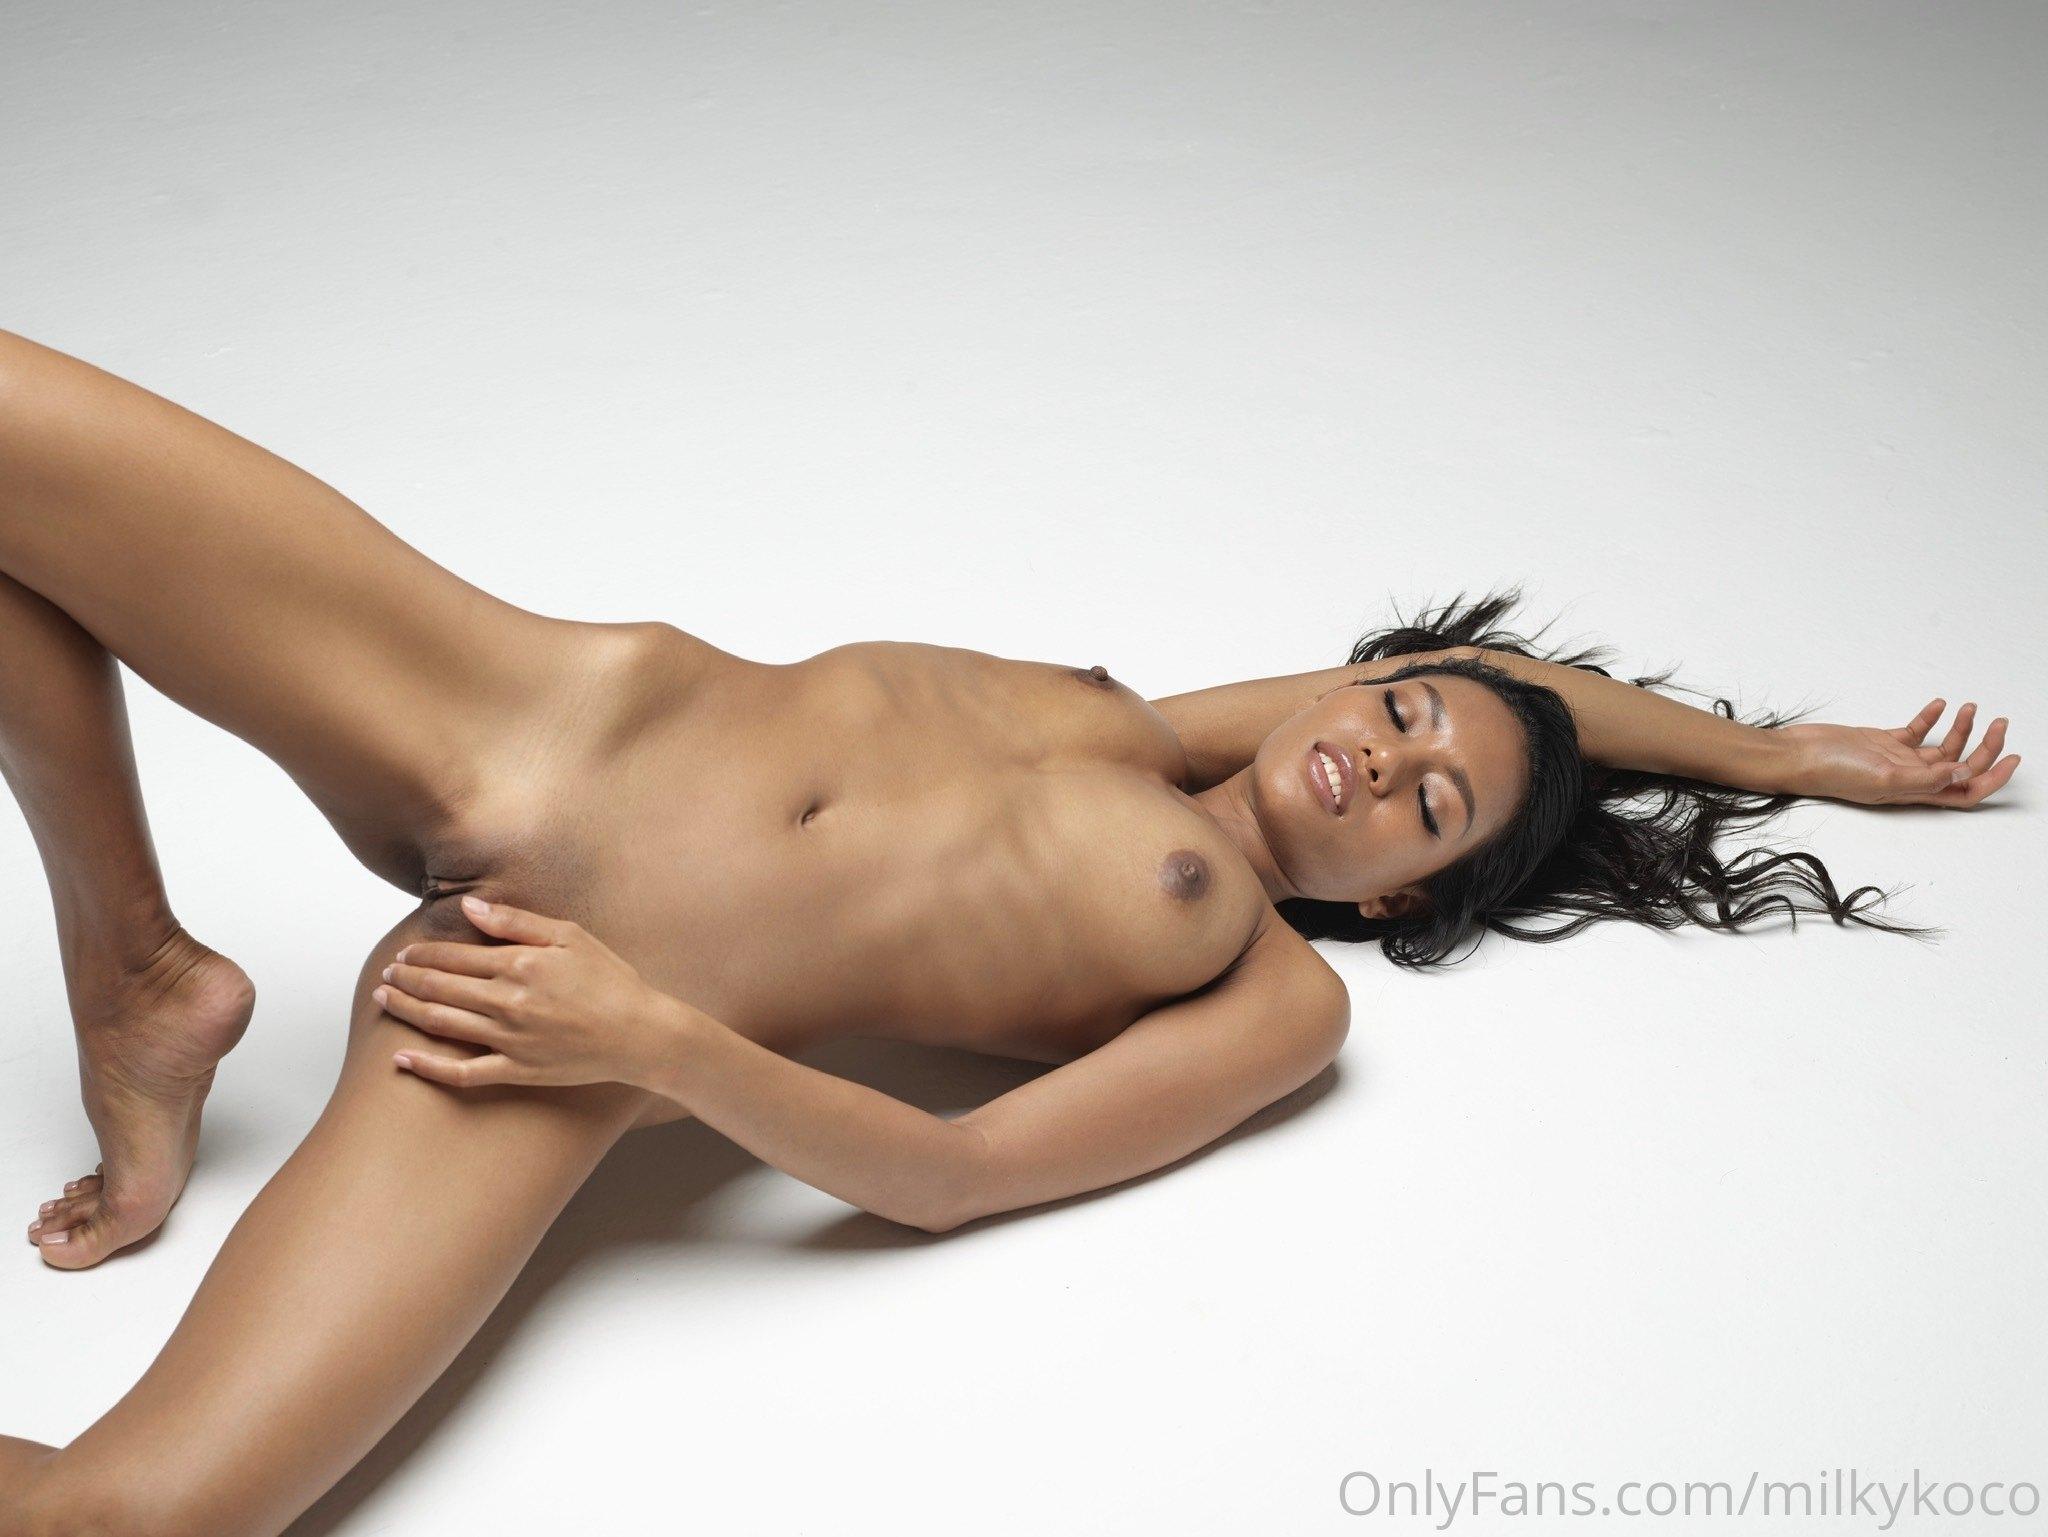 Koko Mylk Bangkok Model Leaked Onlyfans 0097